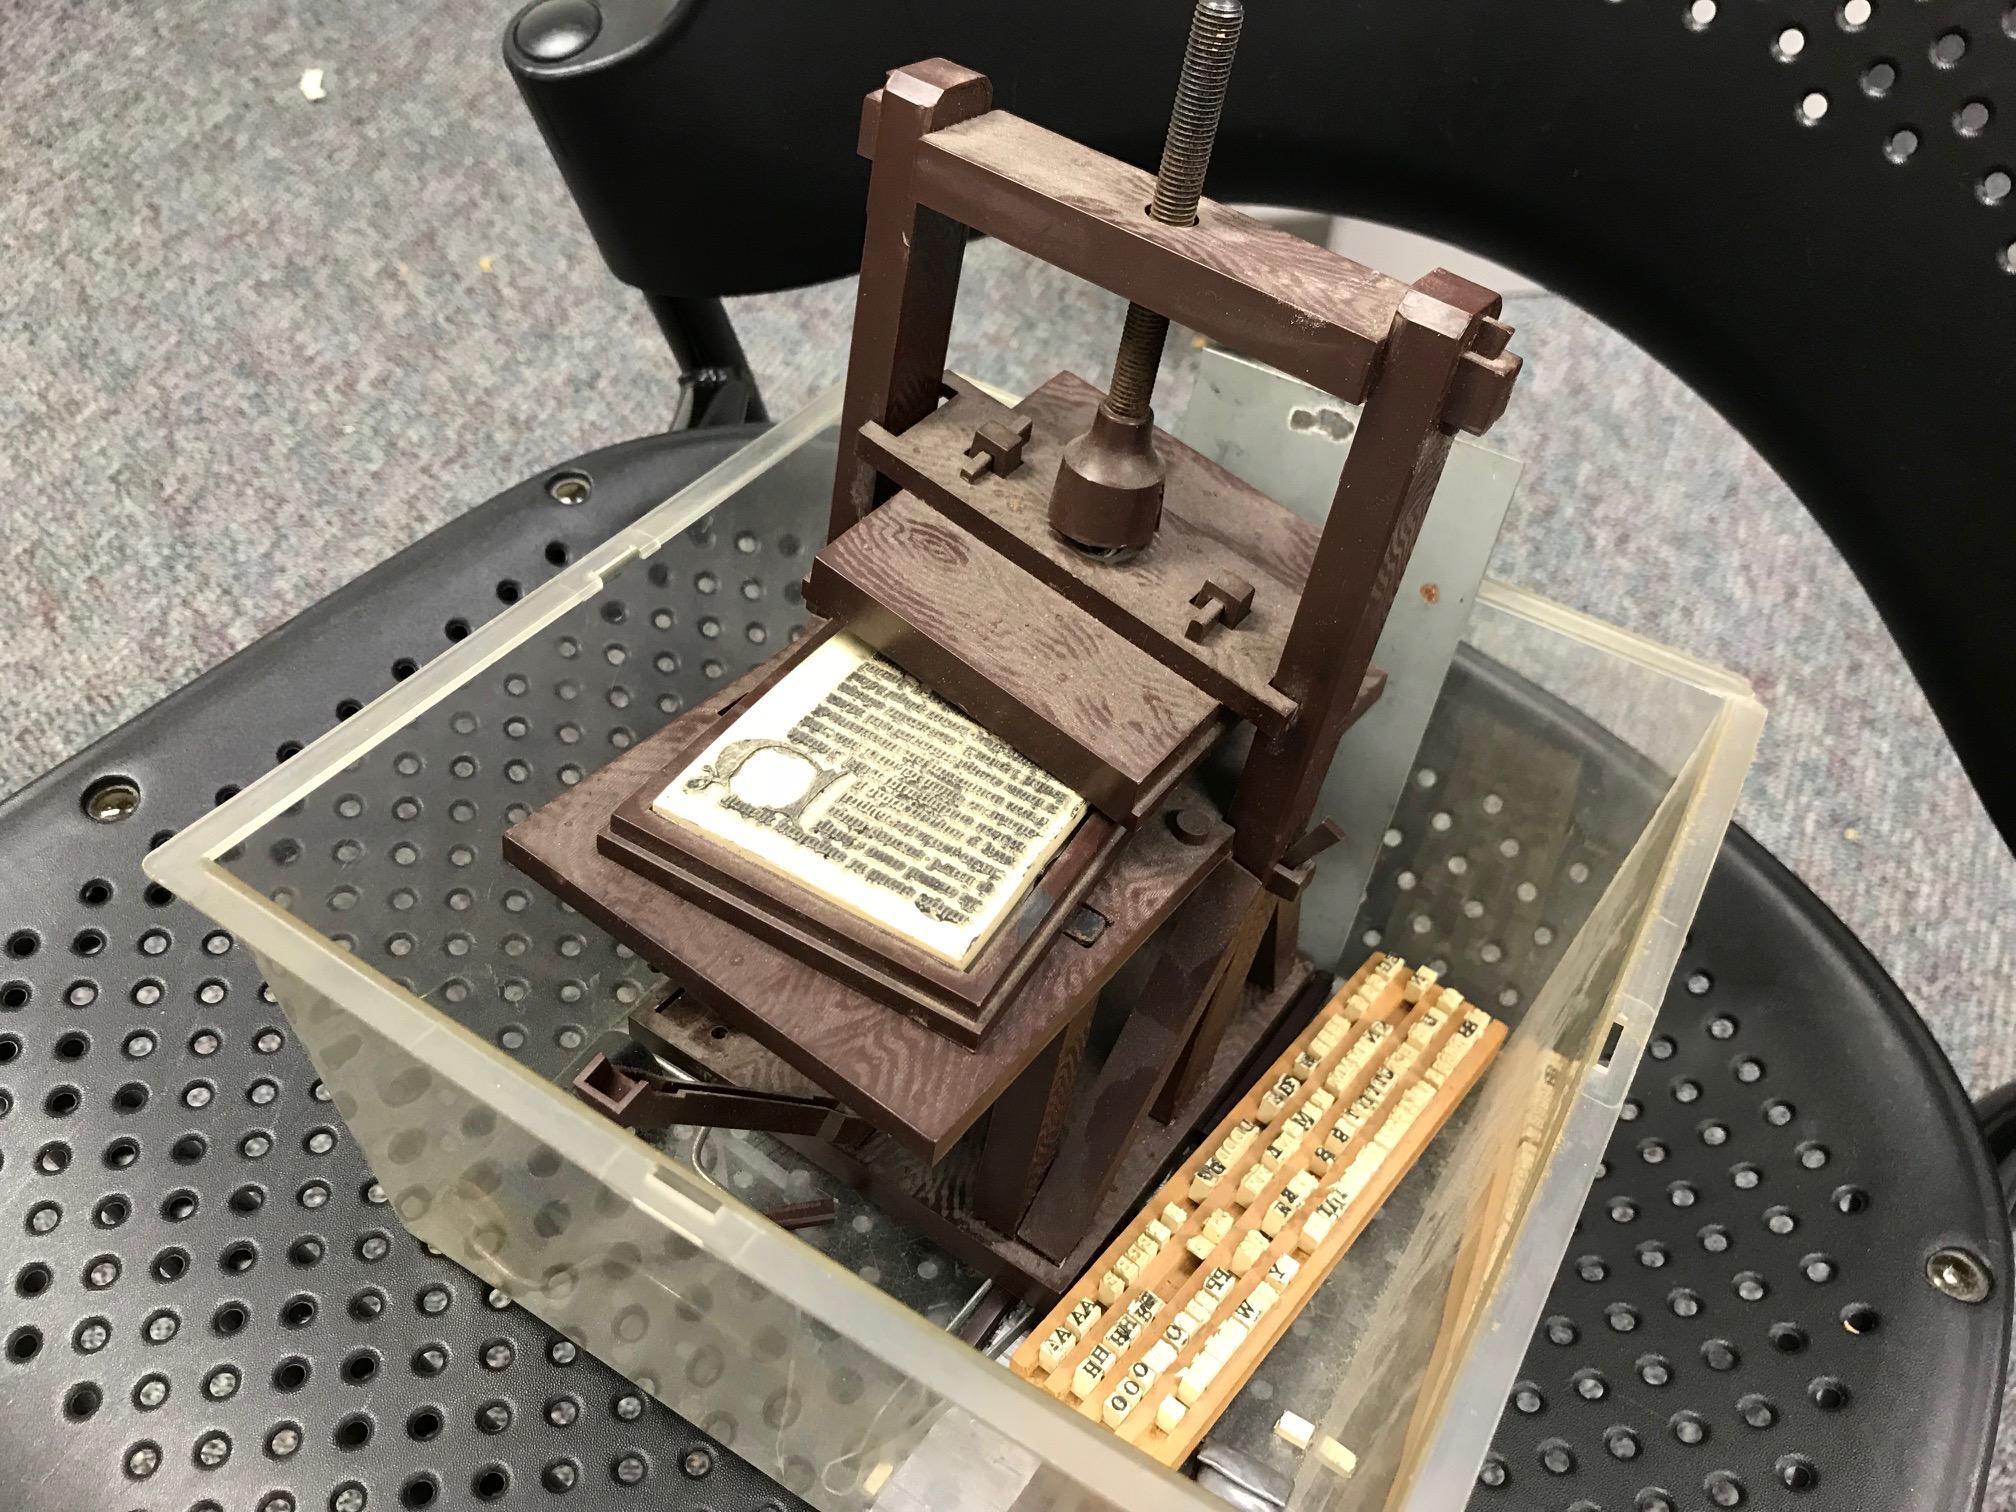 eh_toy_printing_press2_ann_warren